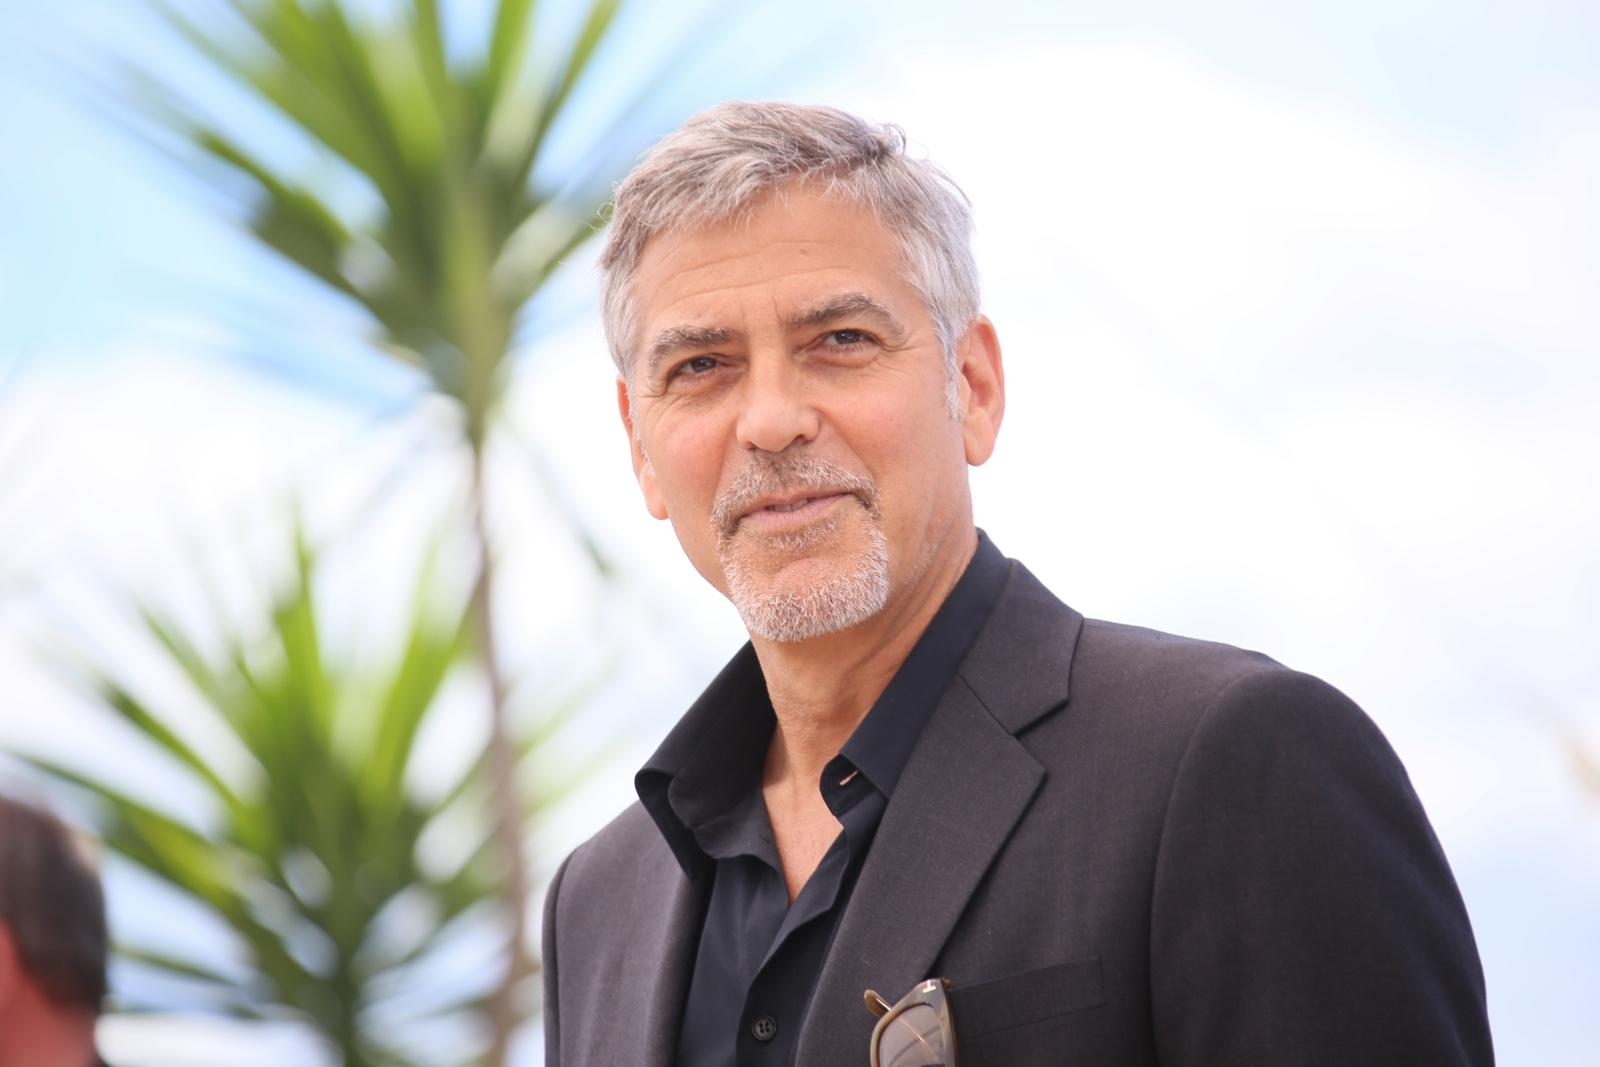 George Clooney - New Naratif